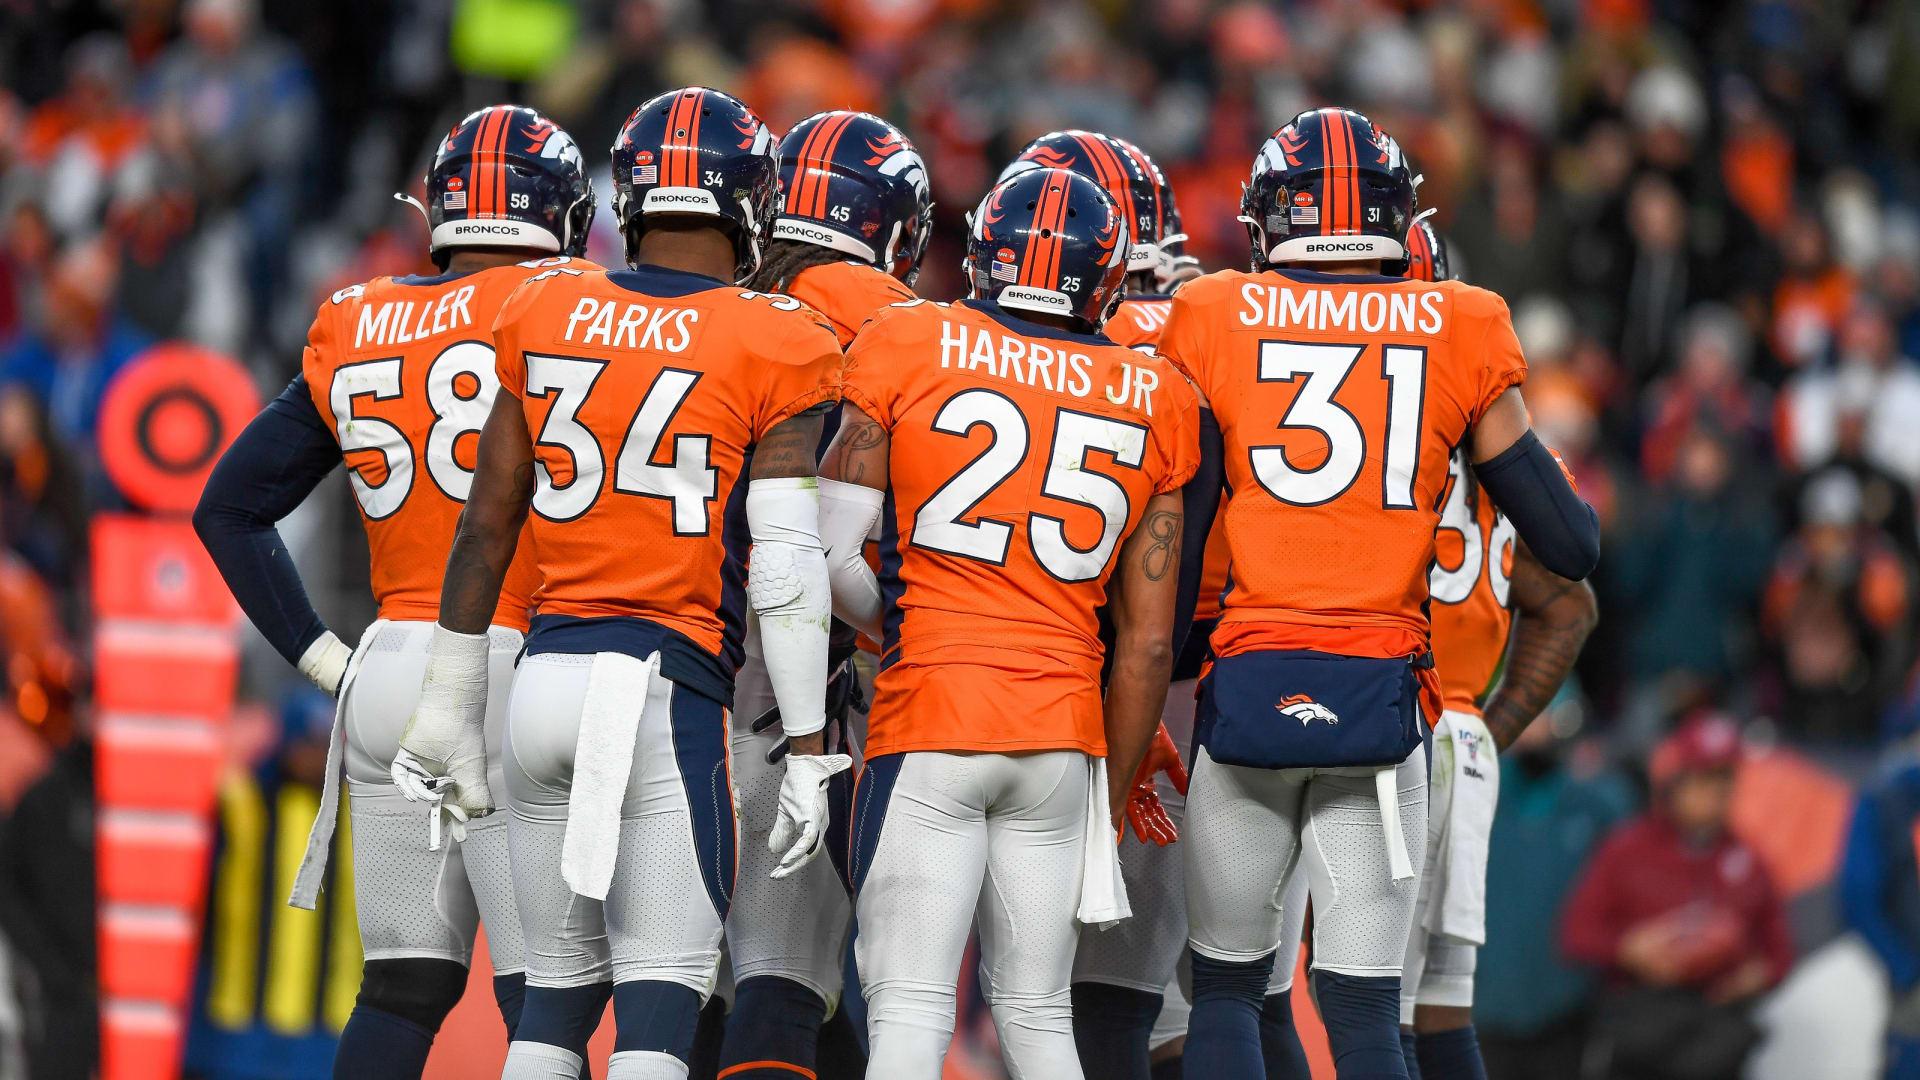 Denver Broncos: Von Miller, Chris Harris Jr. obvious choices for 2010 All-Decade Team